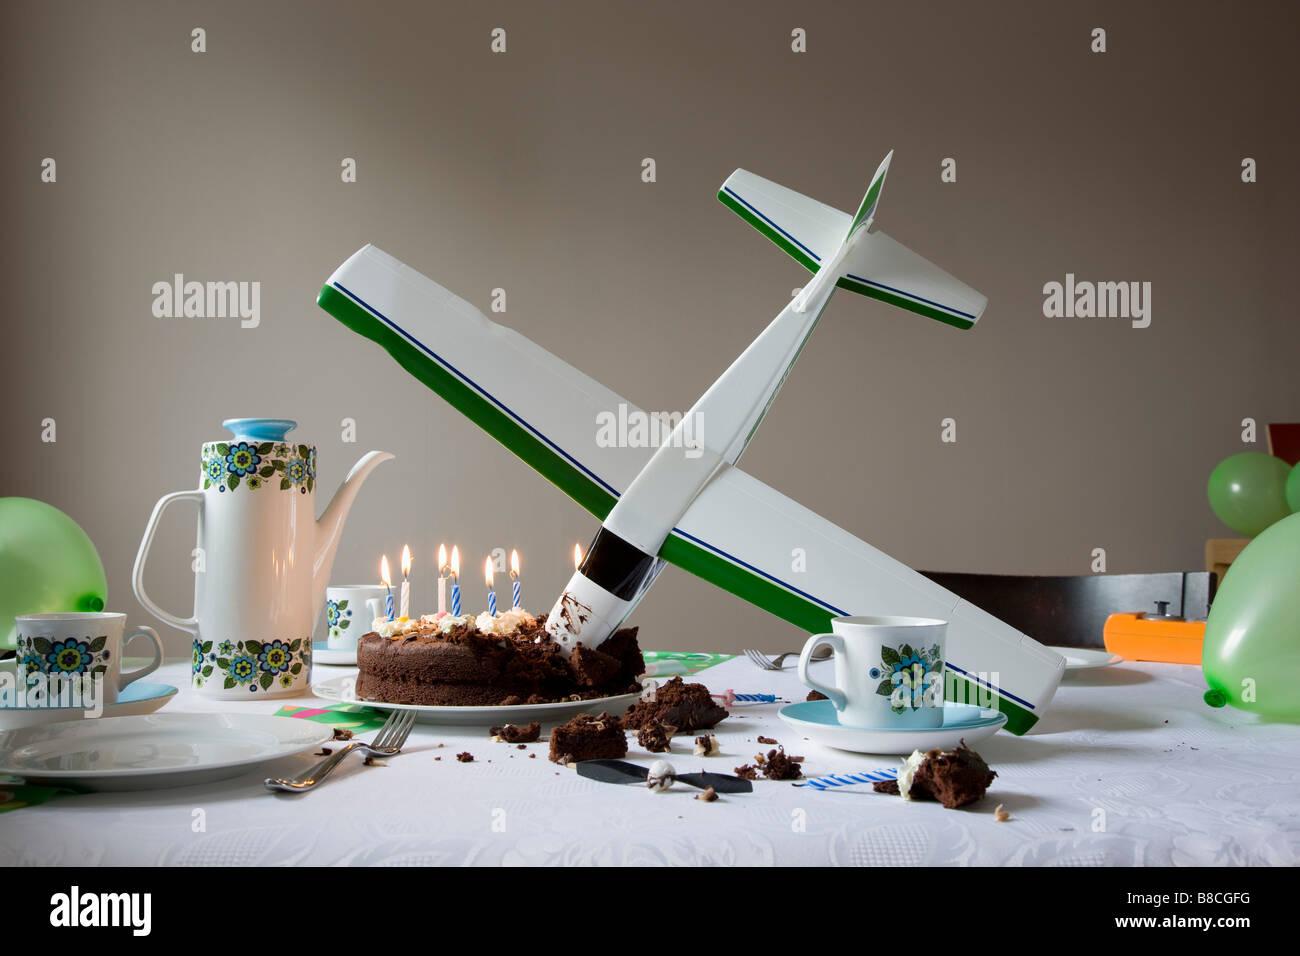 Model Airplane Flown Into Birthday Cake Stock Photo 22404020 Alamy